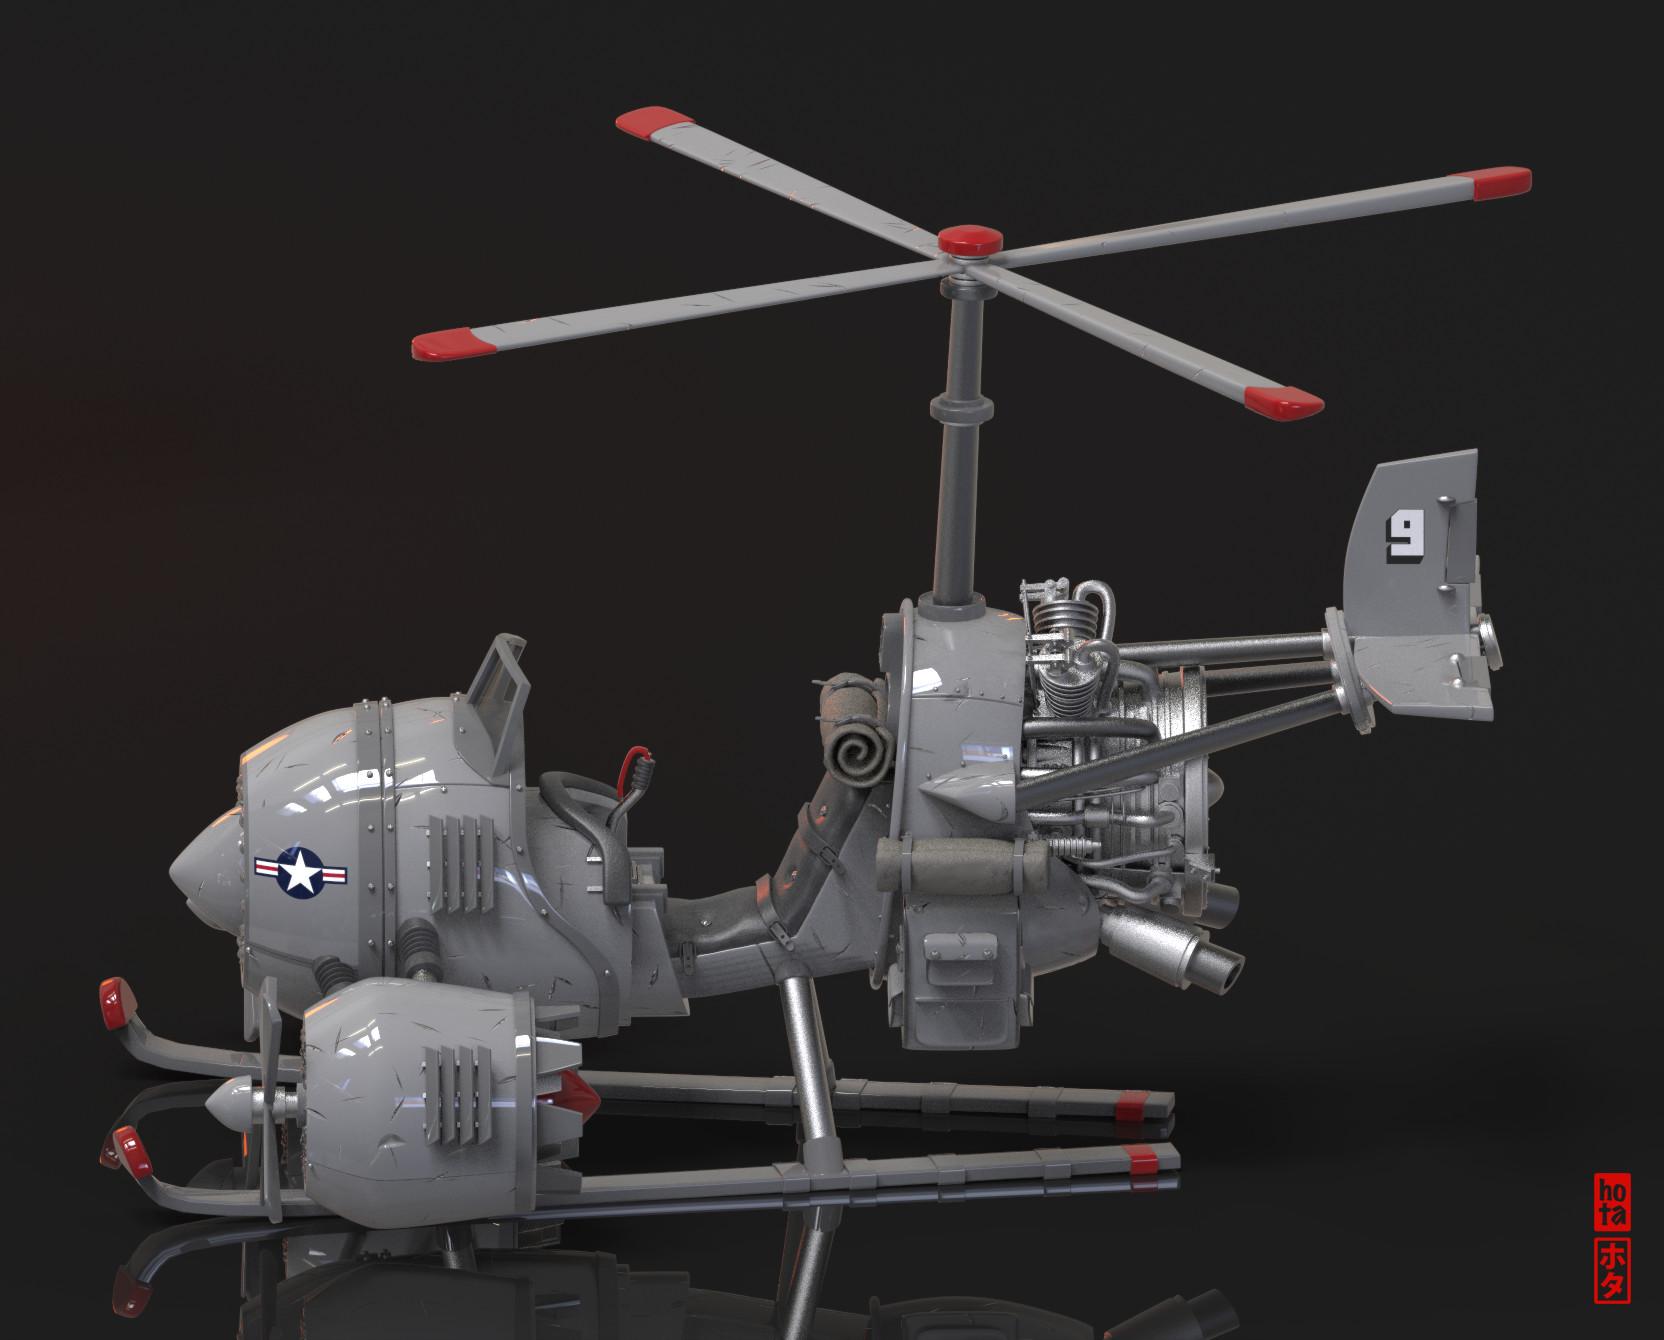 Hota aisa chorrocoptero final 473335239